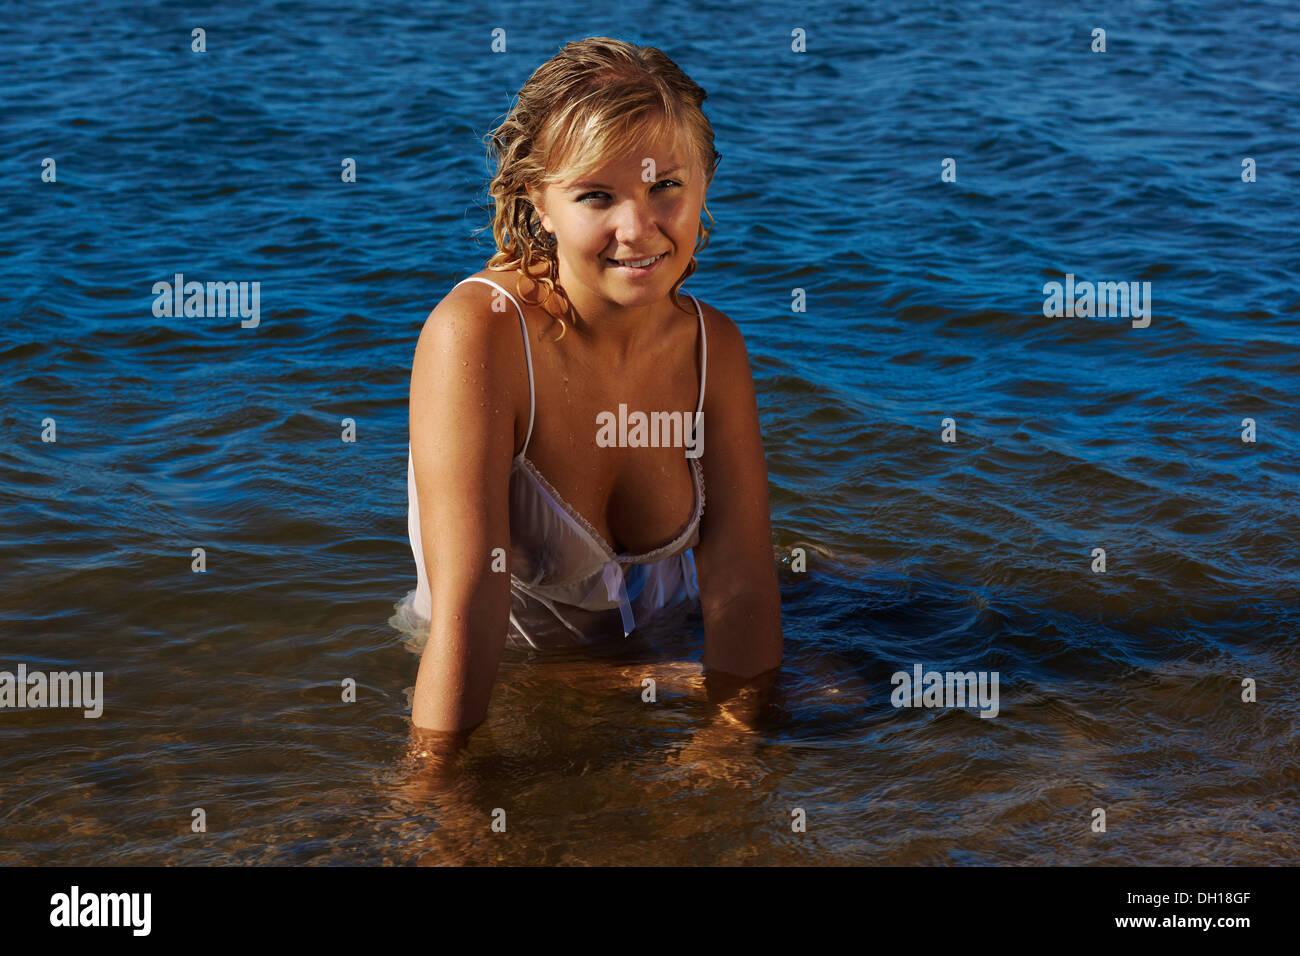 cc731e409 Hermosa chica rubia posando en peignoir húmedo en las aguas de mar ...